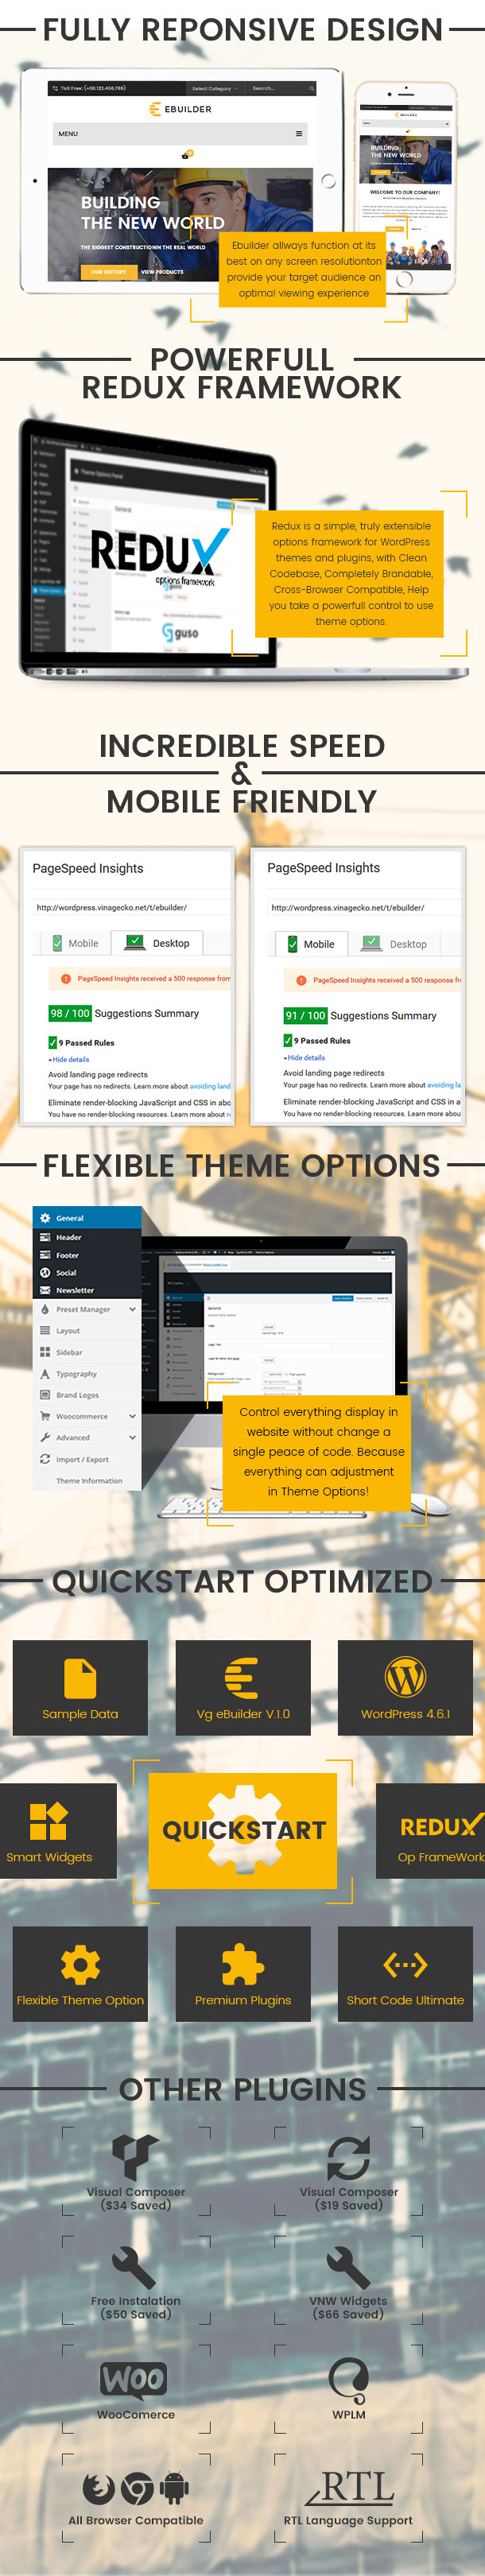 VG eBuilder - Construction and Builder WordPress Theme - 19